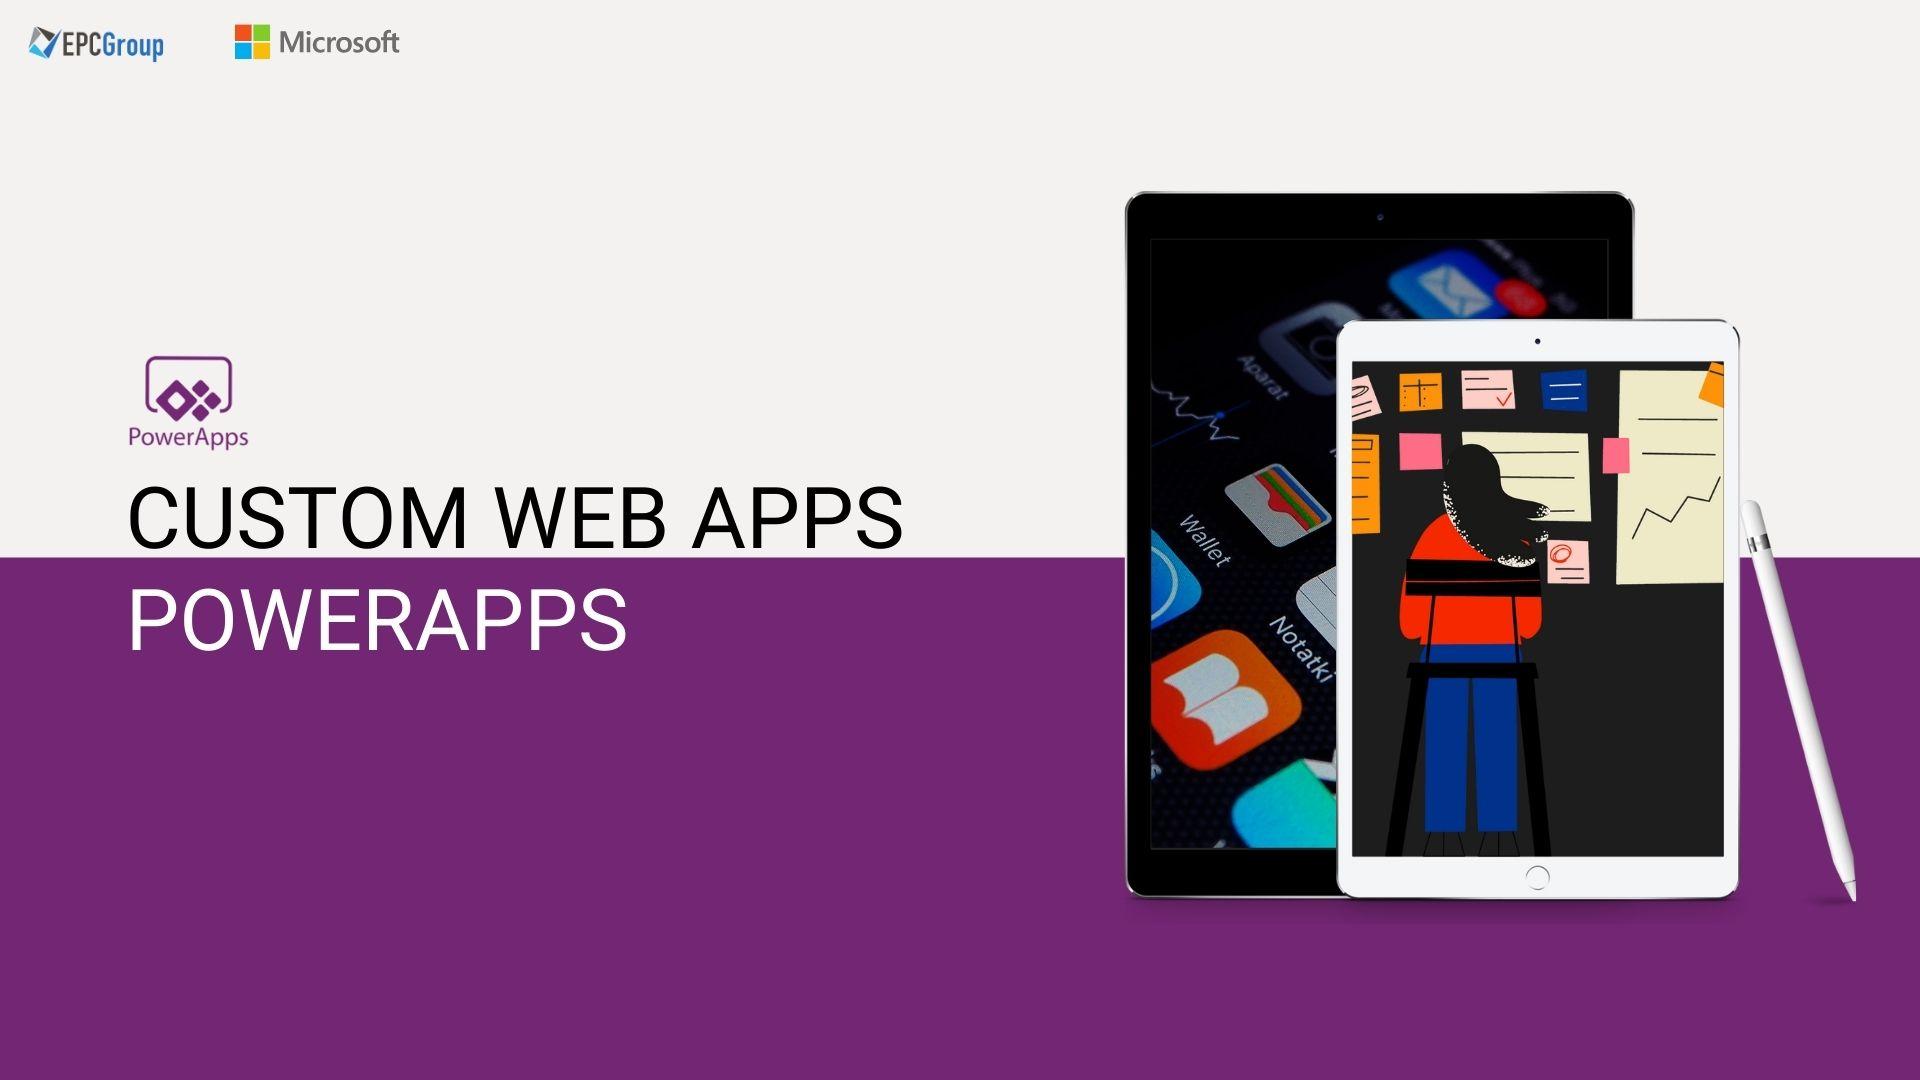 Building Custom Web Apps Using PowerApps - thumb image